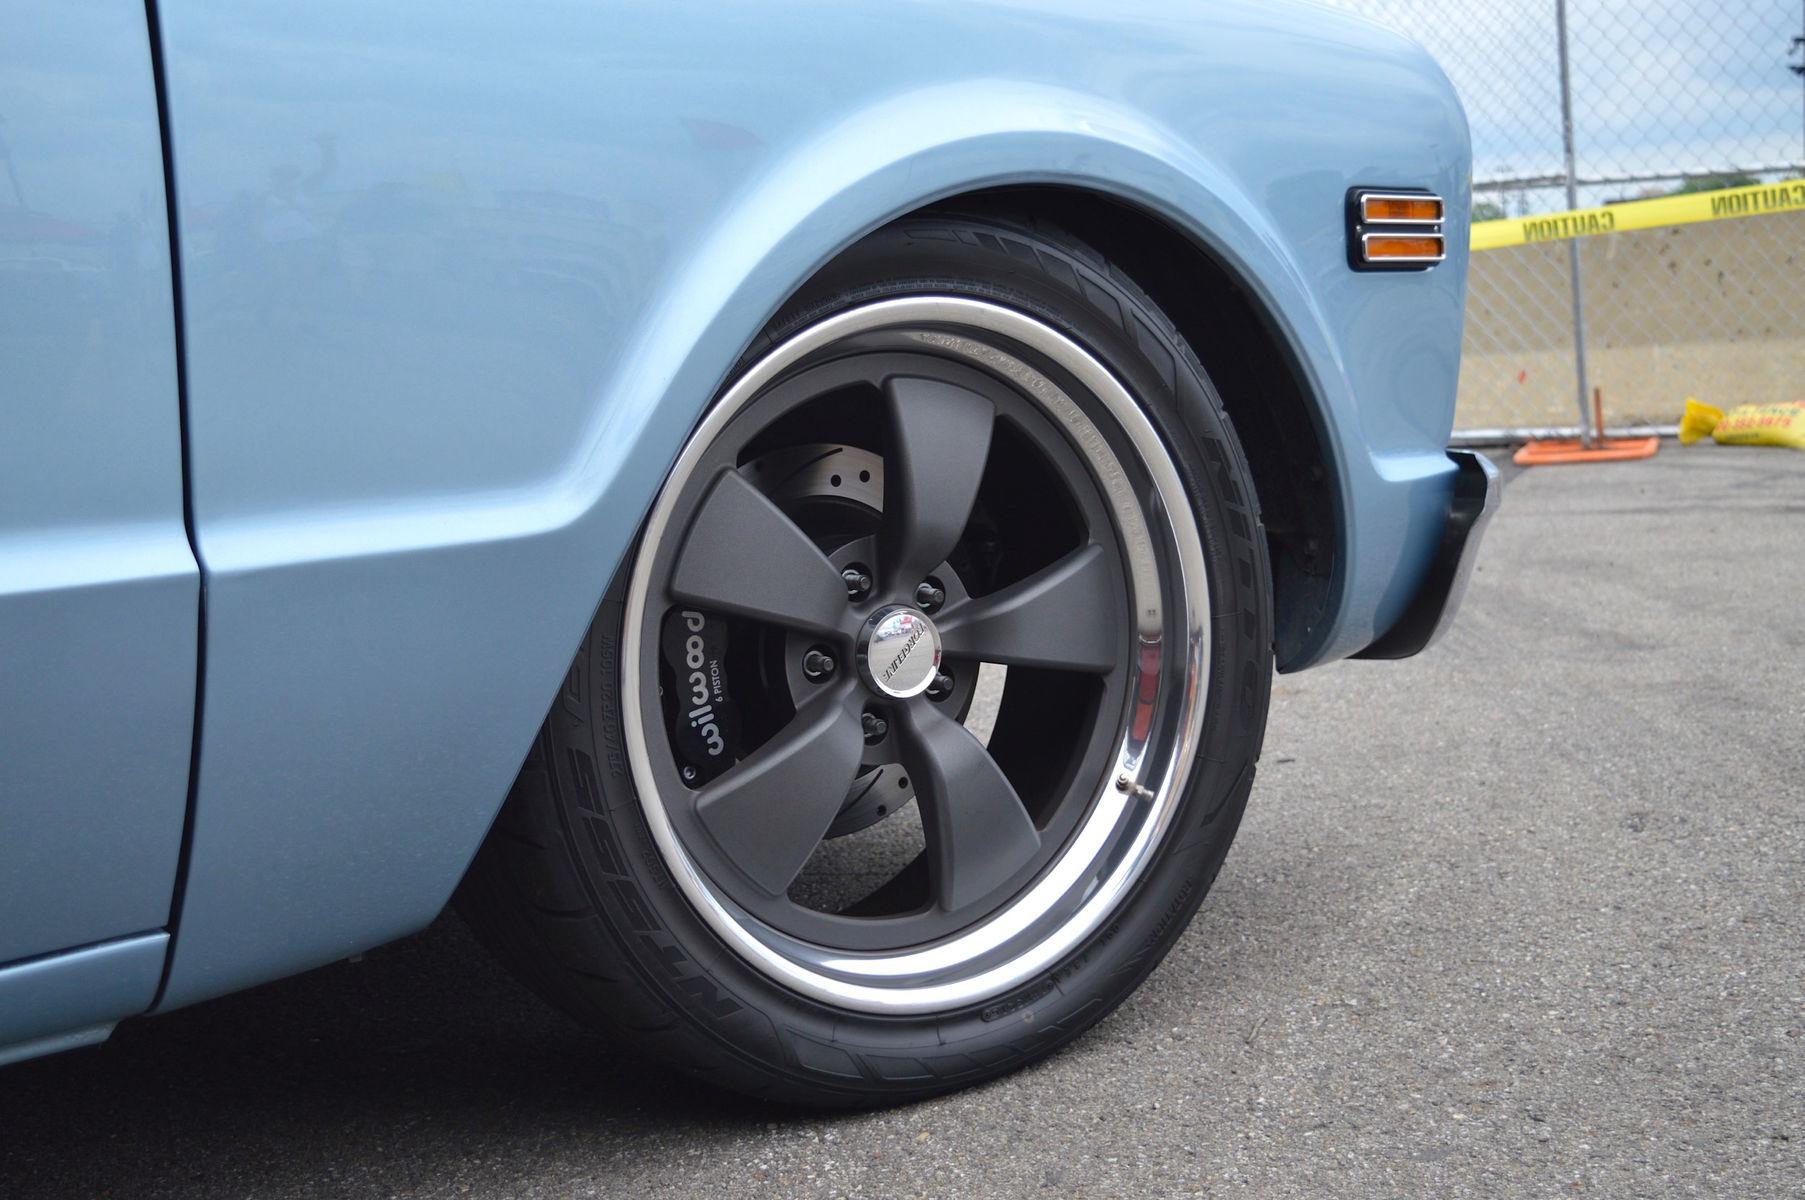 1968 Chevrolet C-10 | Randy Johnson's D&Z Customs 1968 Chevy C10 Shop Truck on Forgeline Heritage Series CR3 Wheels